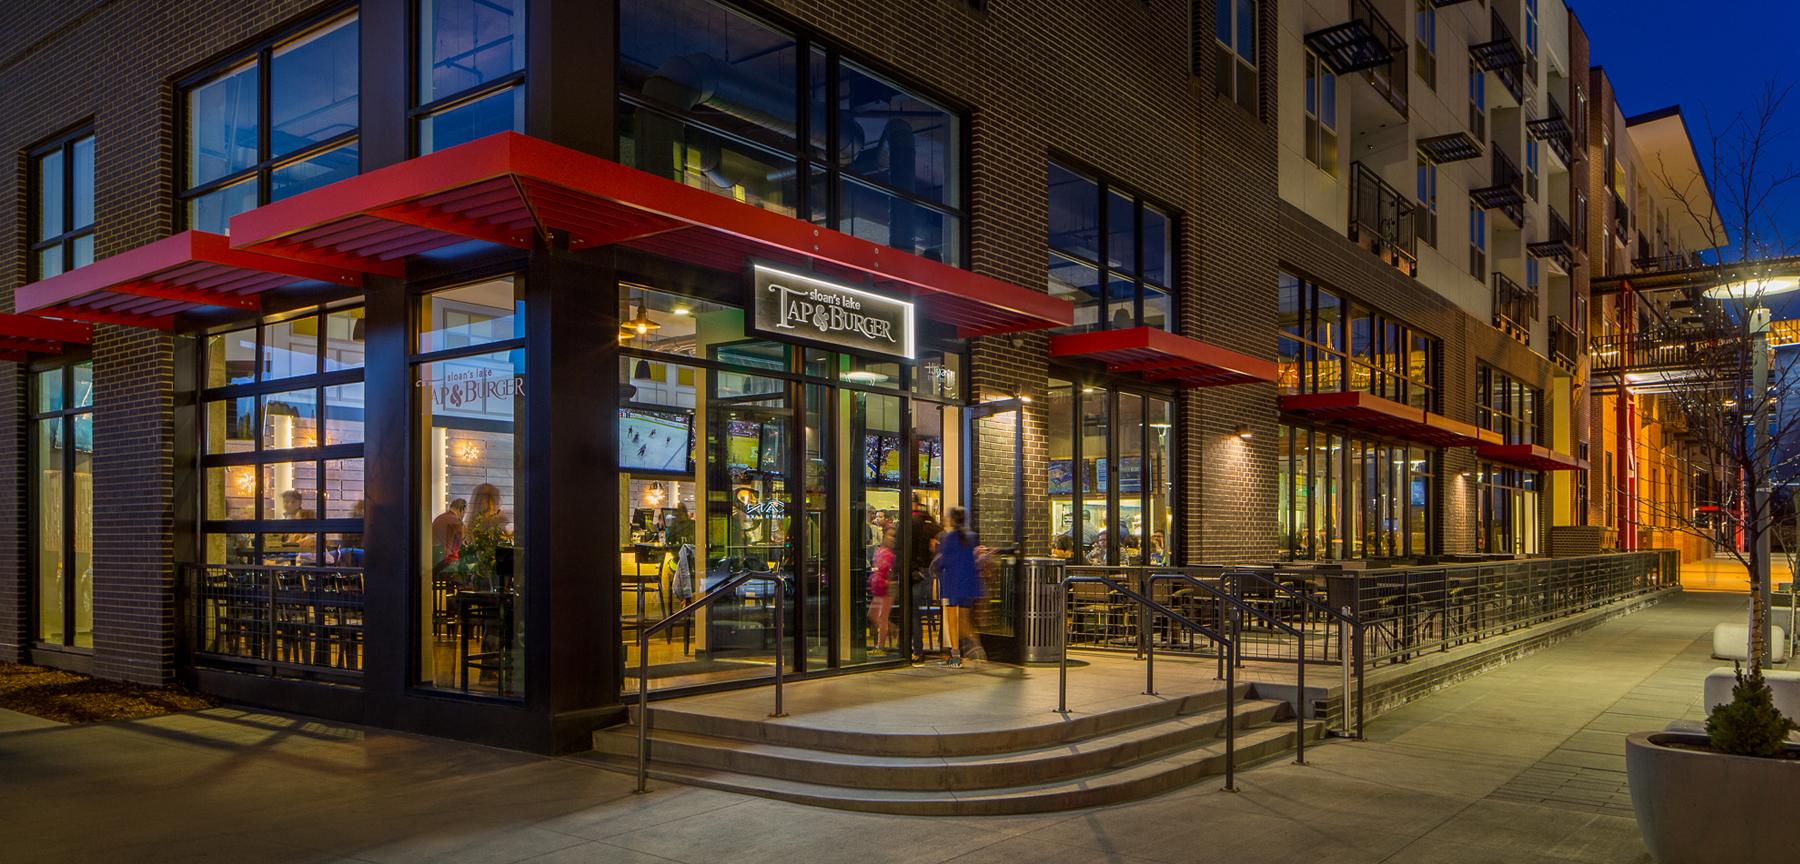 Sloan's Lake Tap & Burger exterior